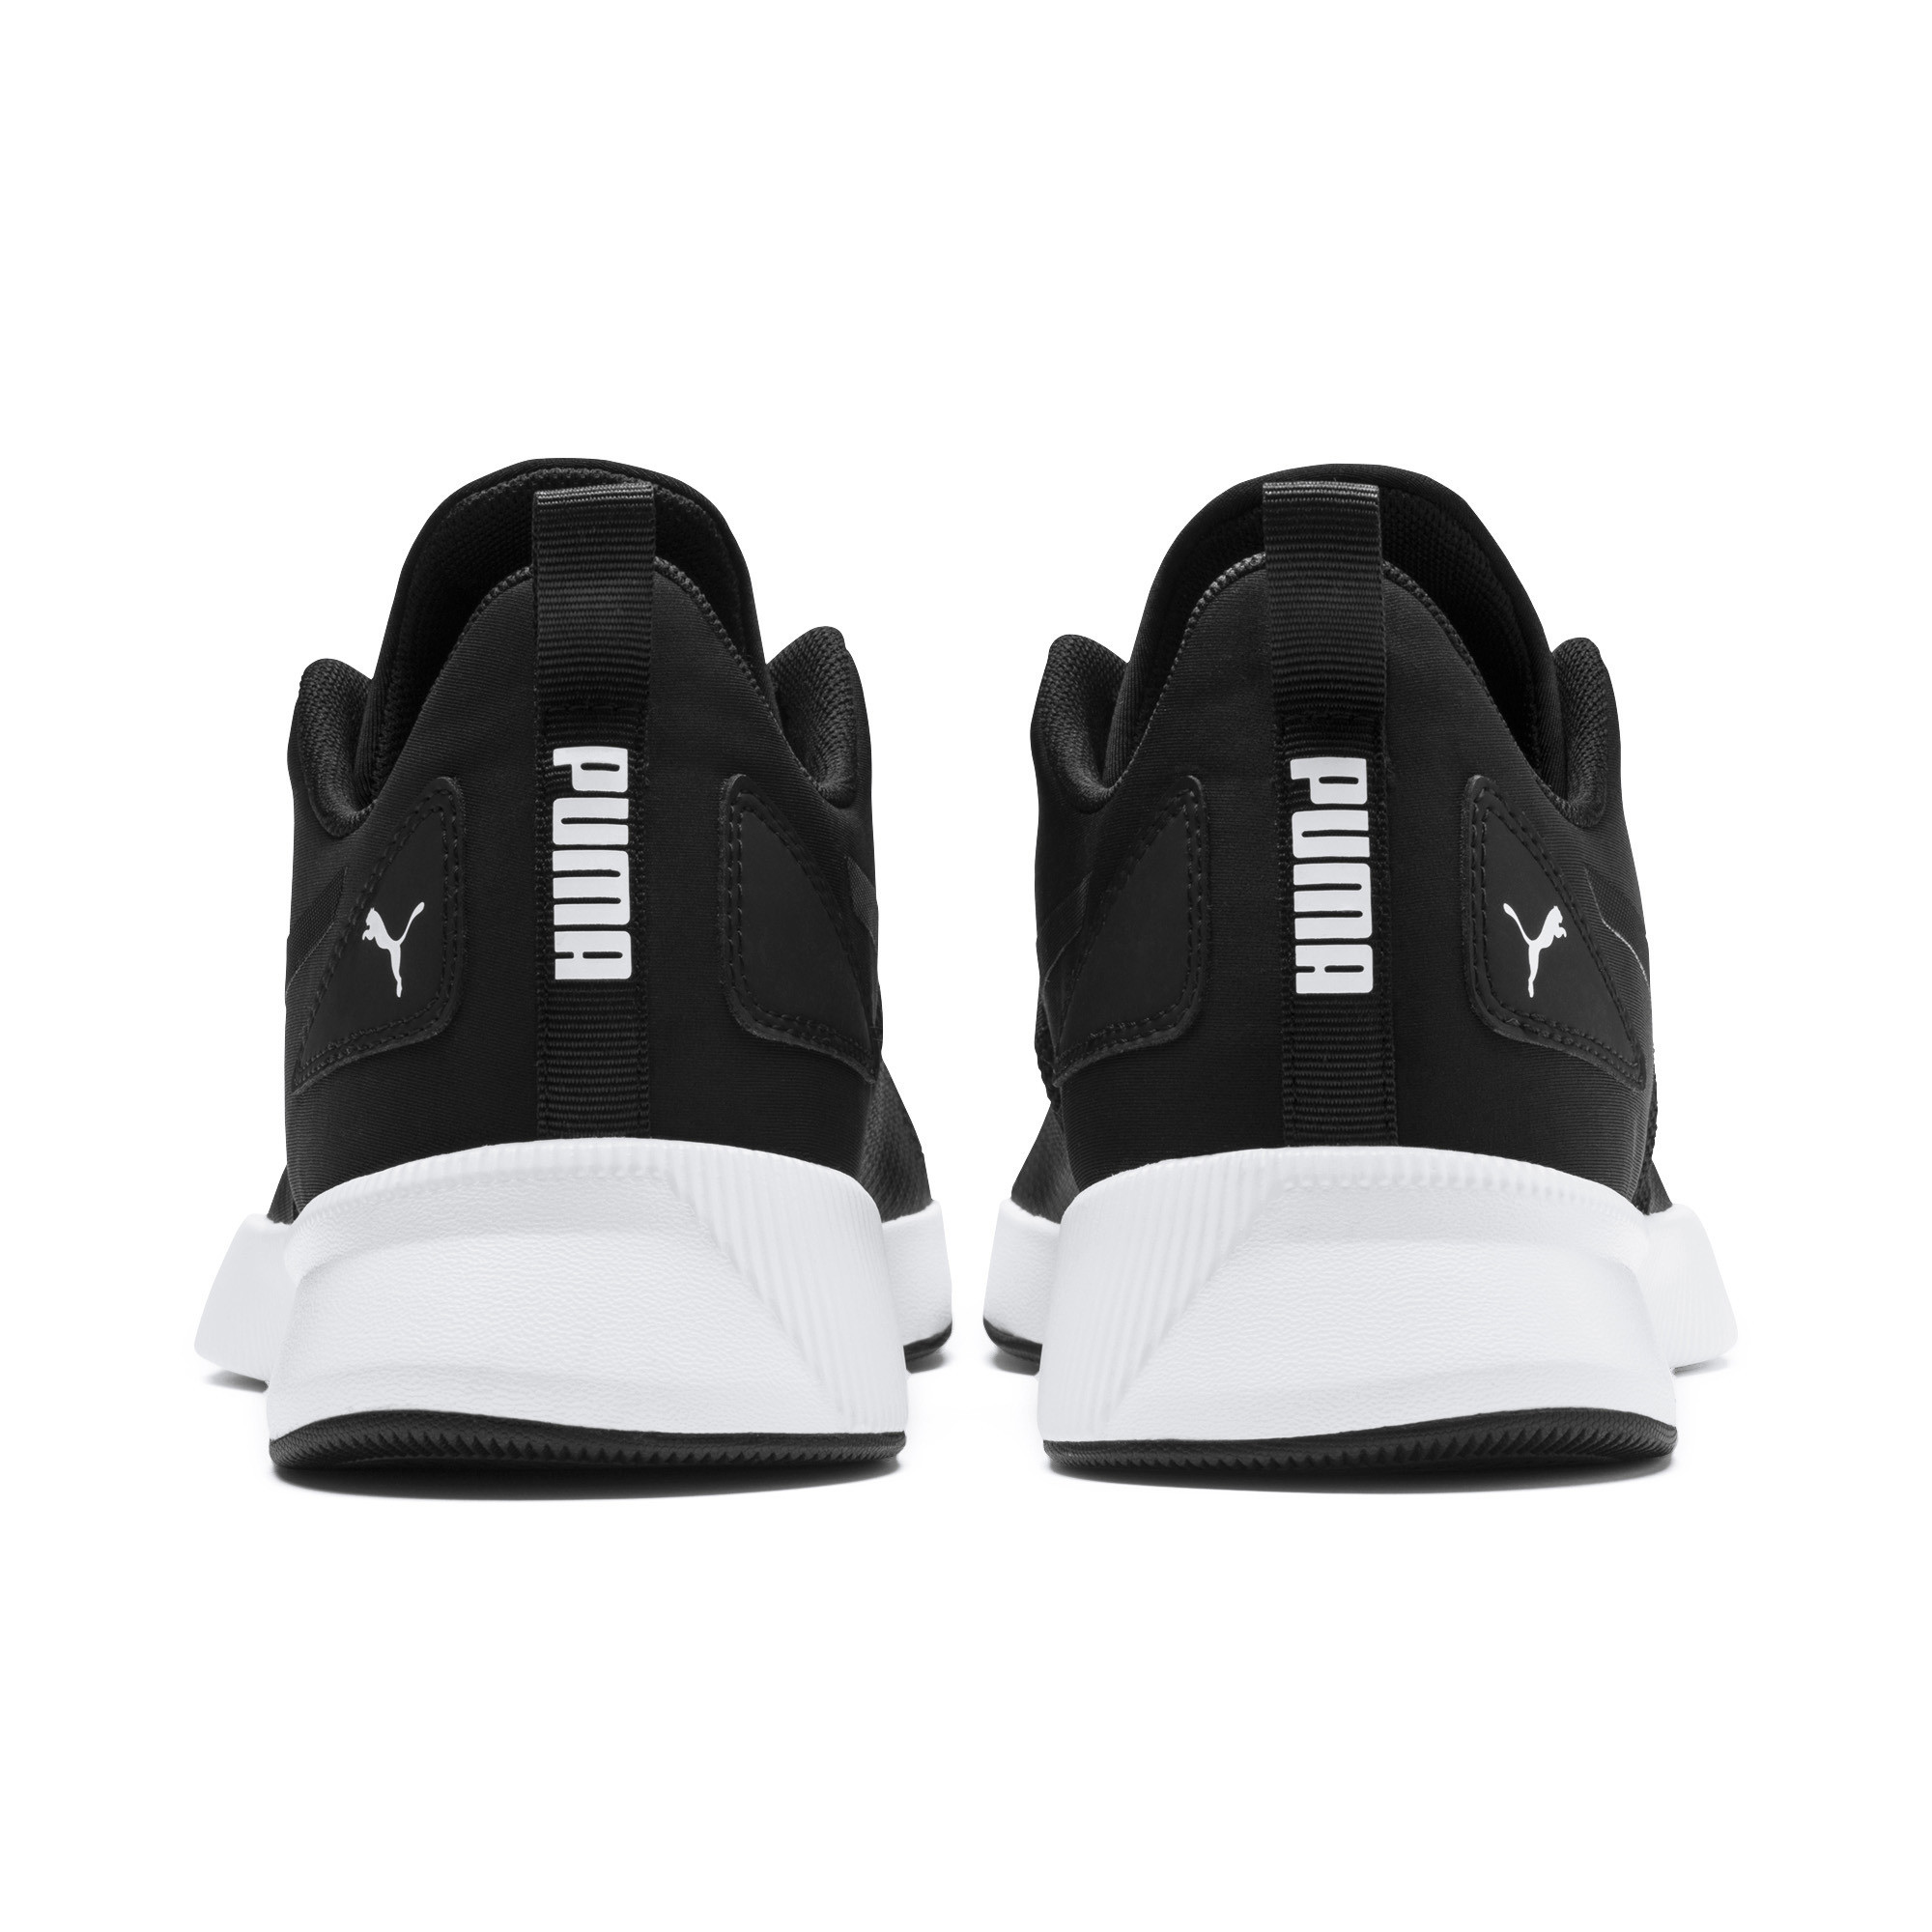 PUMA-Flyer-Runner-Running-Shoes-Mens-Shoe-Running thumbnail 3